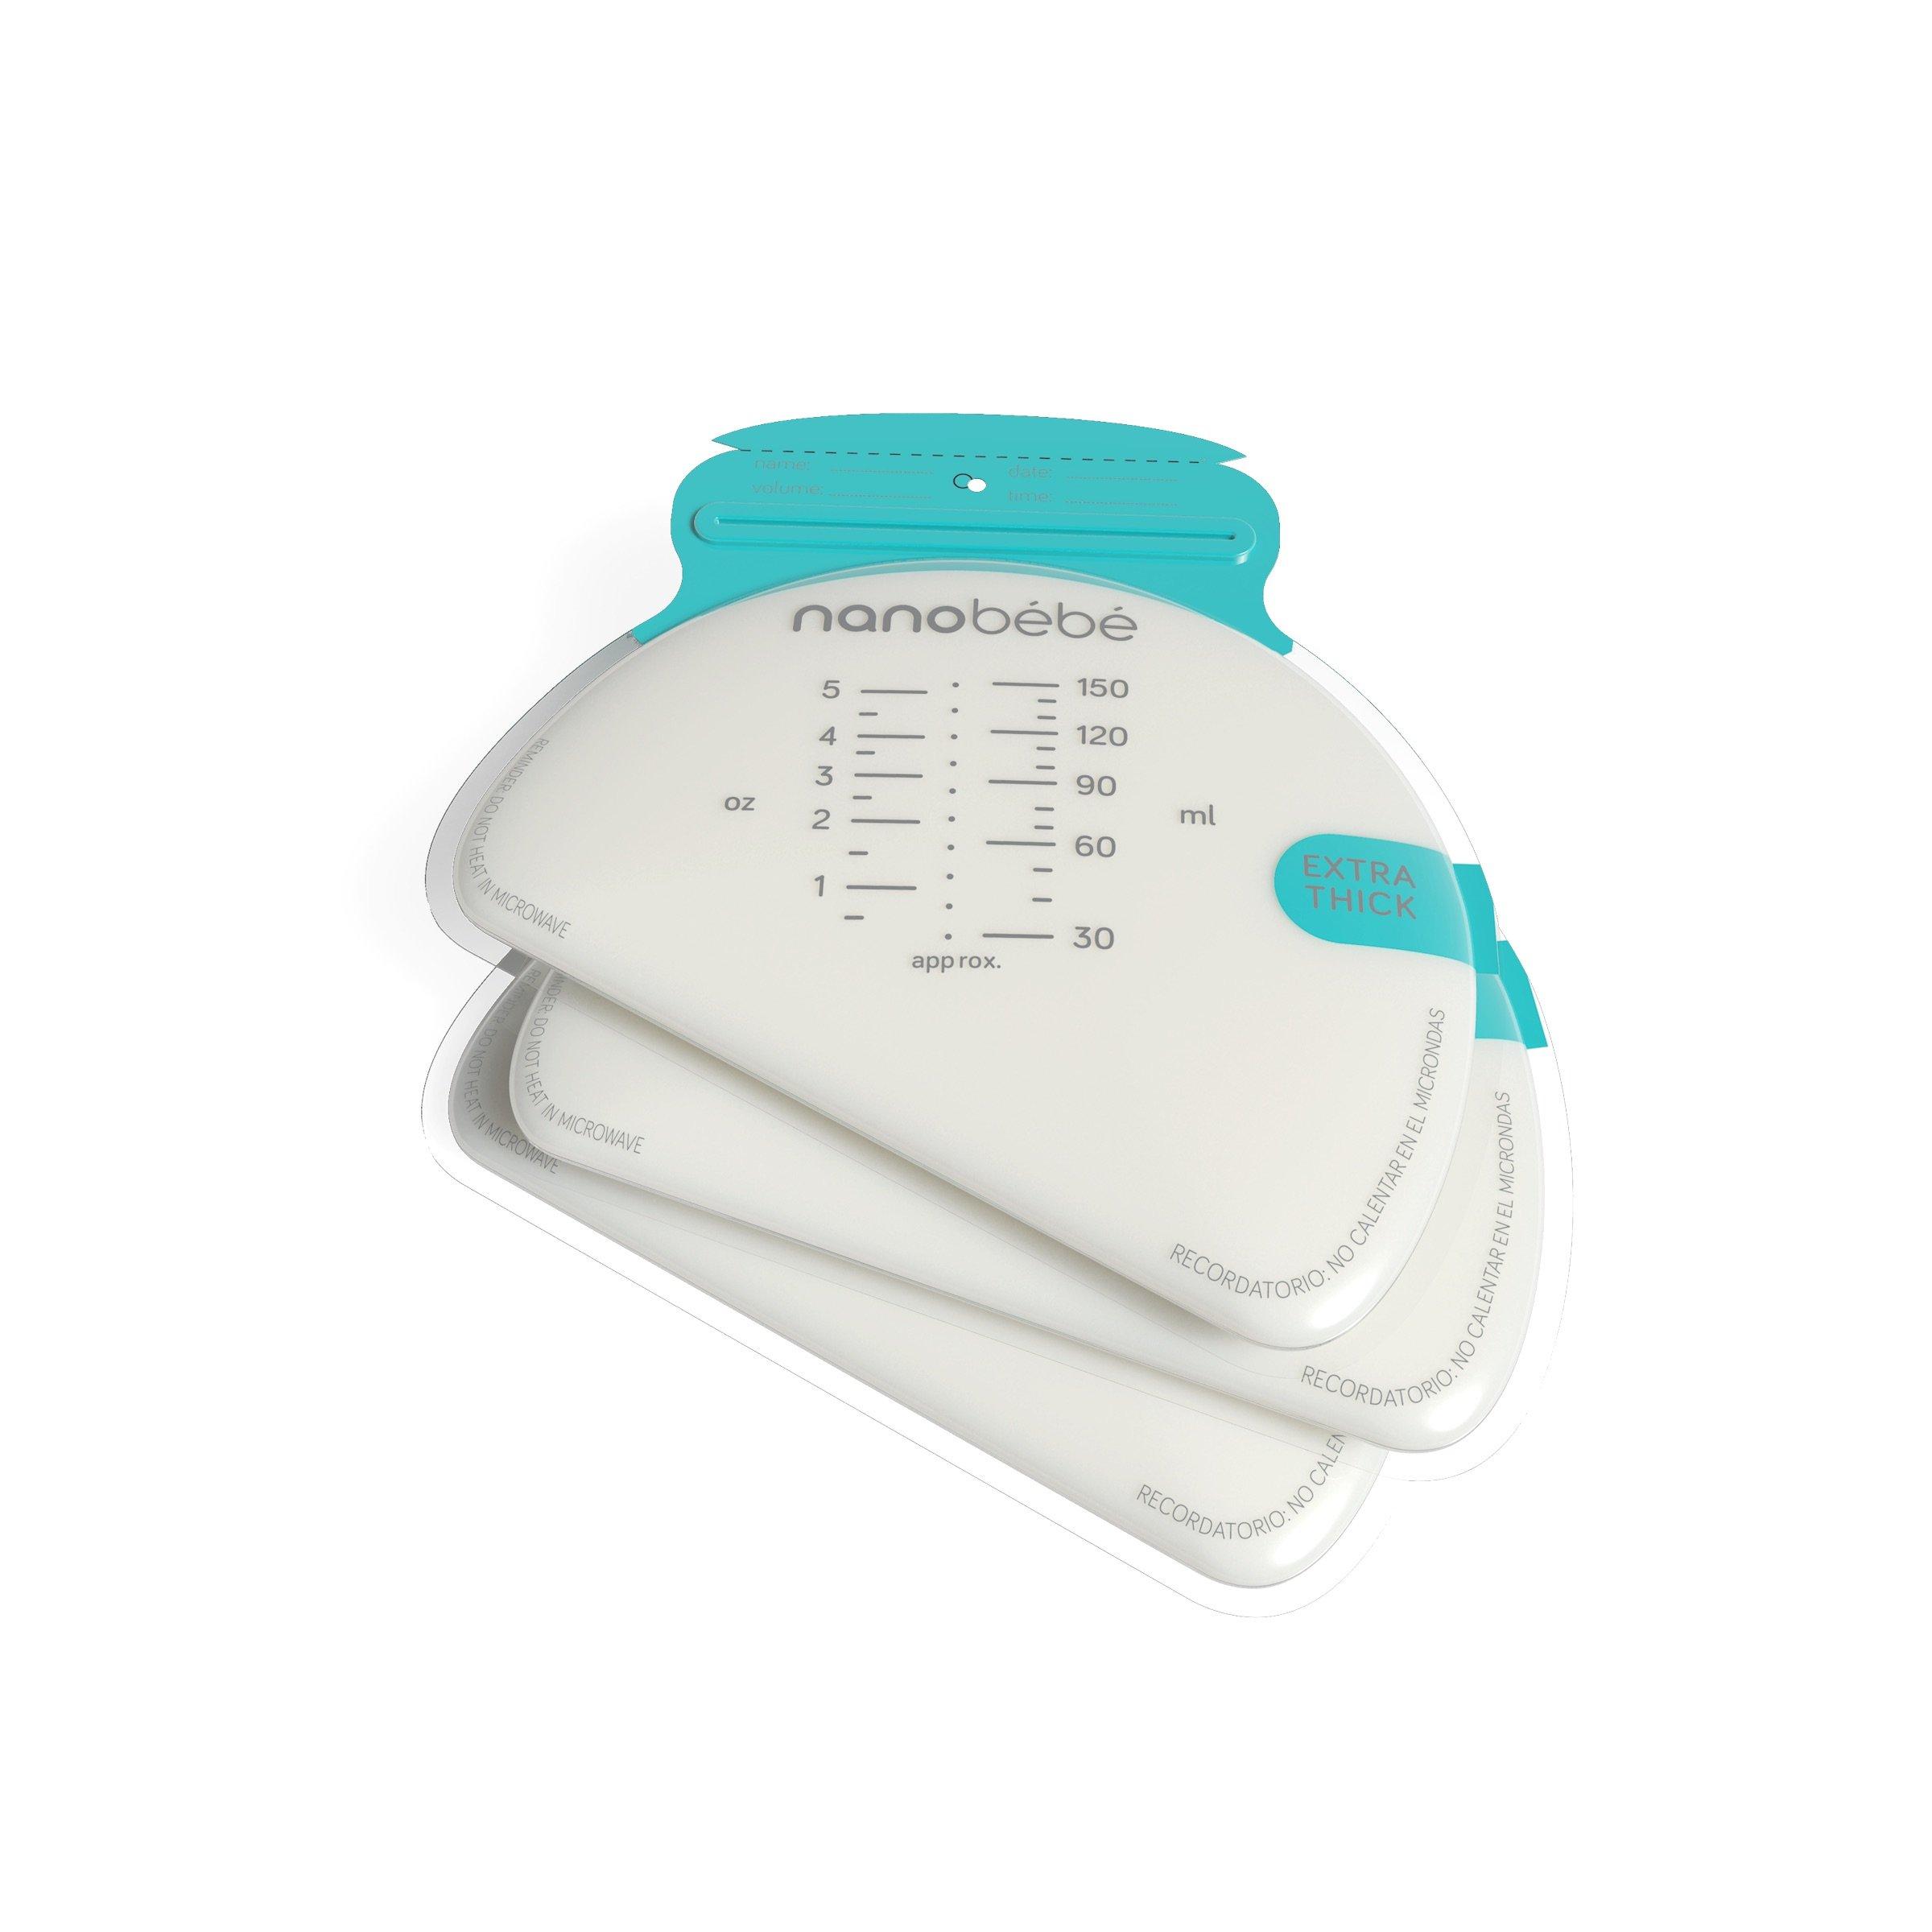 nanobebe Breastmilk Freezer Storage Bags, 50 Pack Flat Stacking Breastfeeding Storage Extra Thick Breastfed Baby Bags (Moms Choice Award Winner)